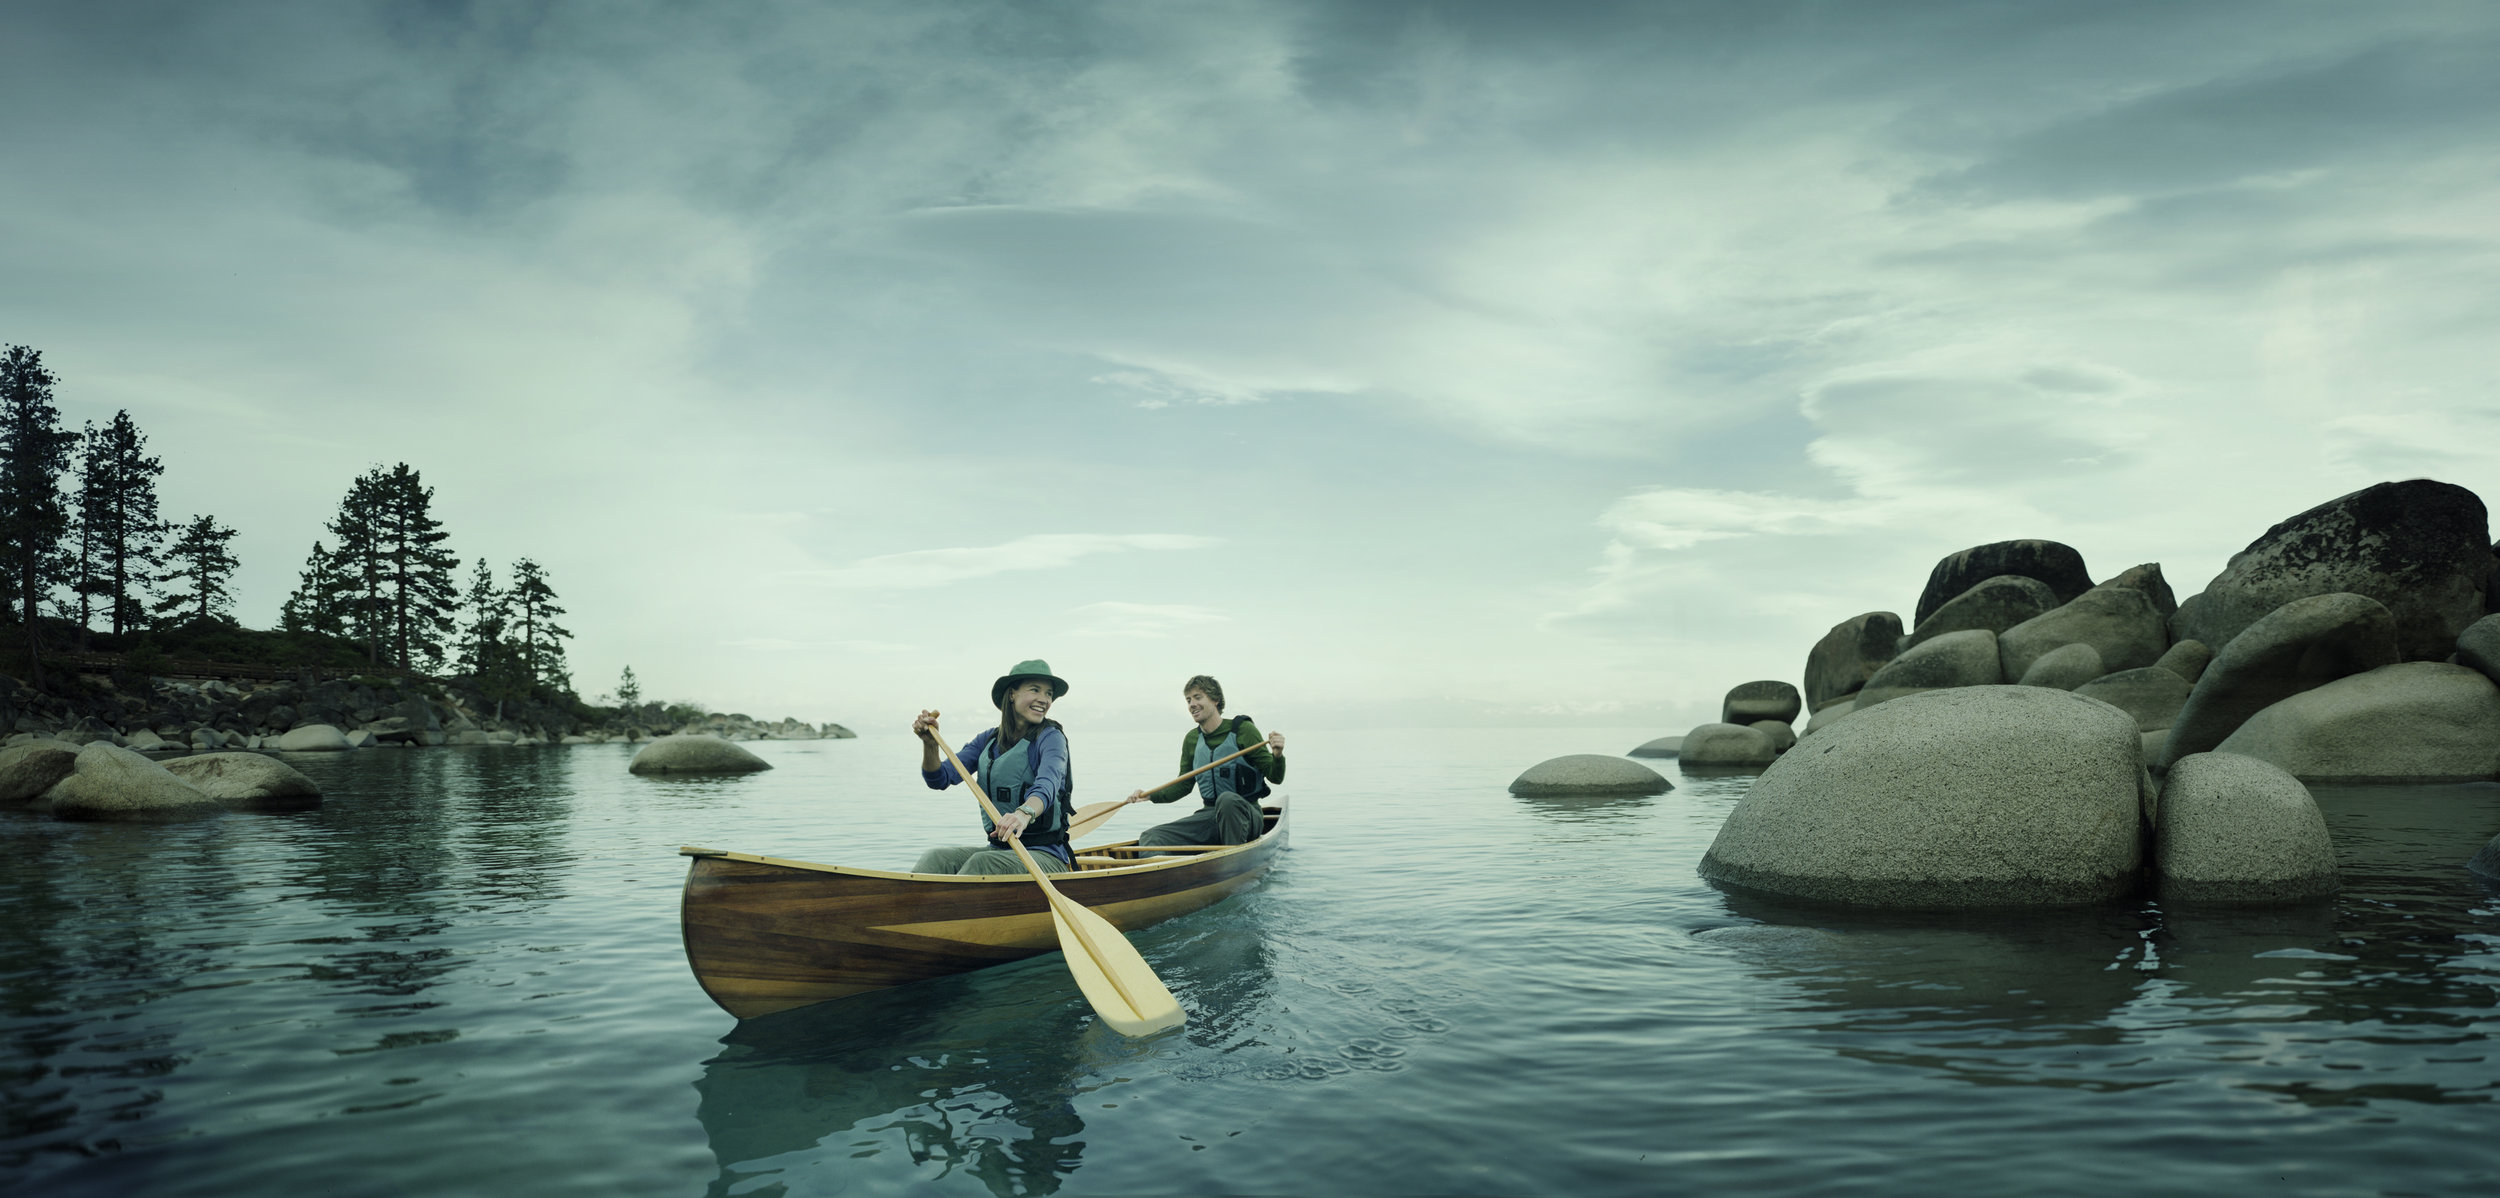 Advair_canoe_150dpi.jpg